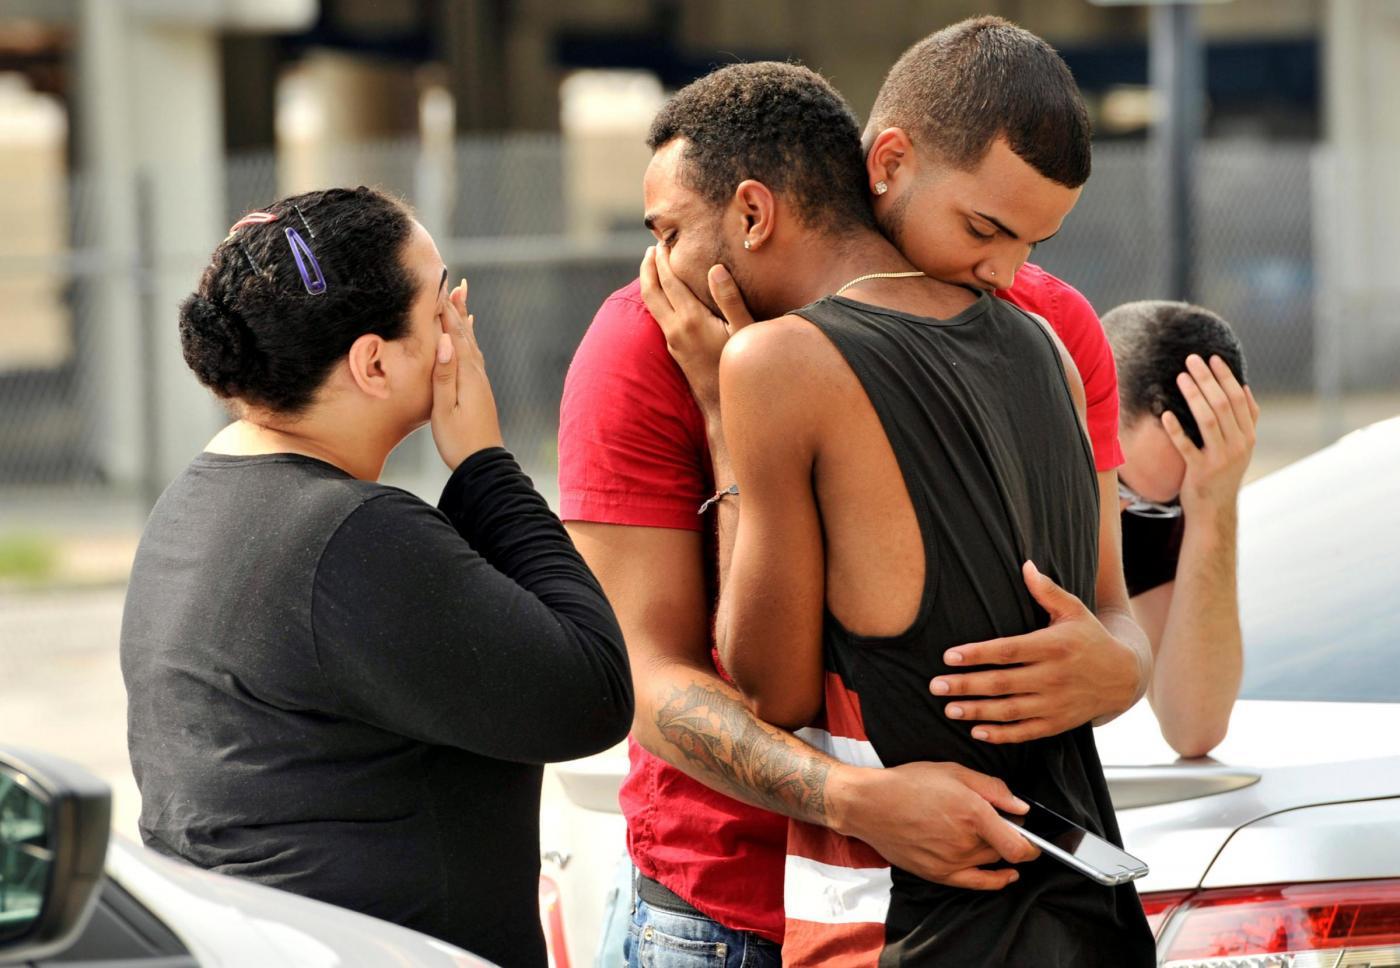 Florida, sparatoria in locale gay